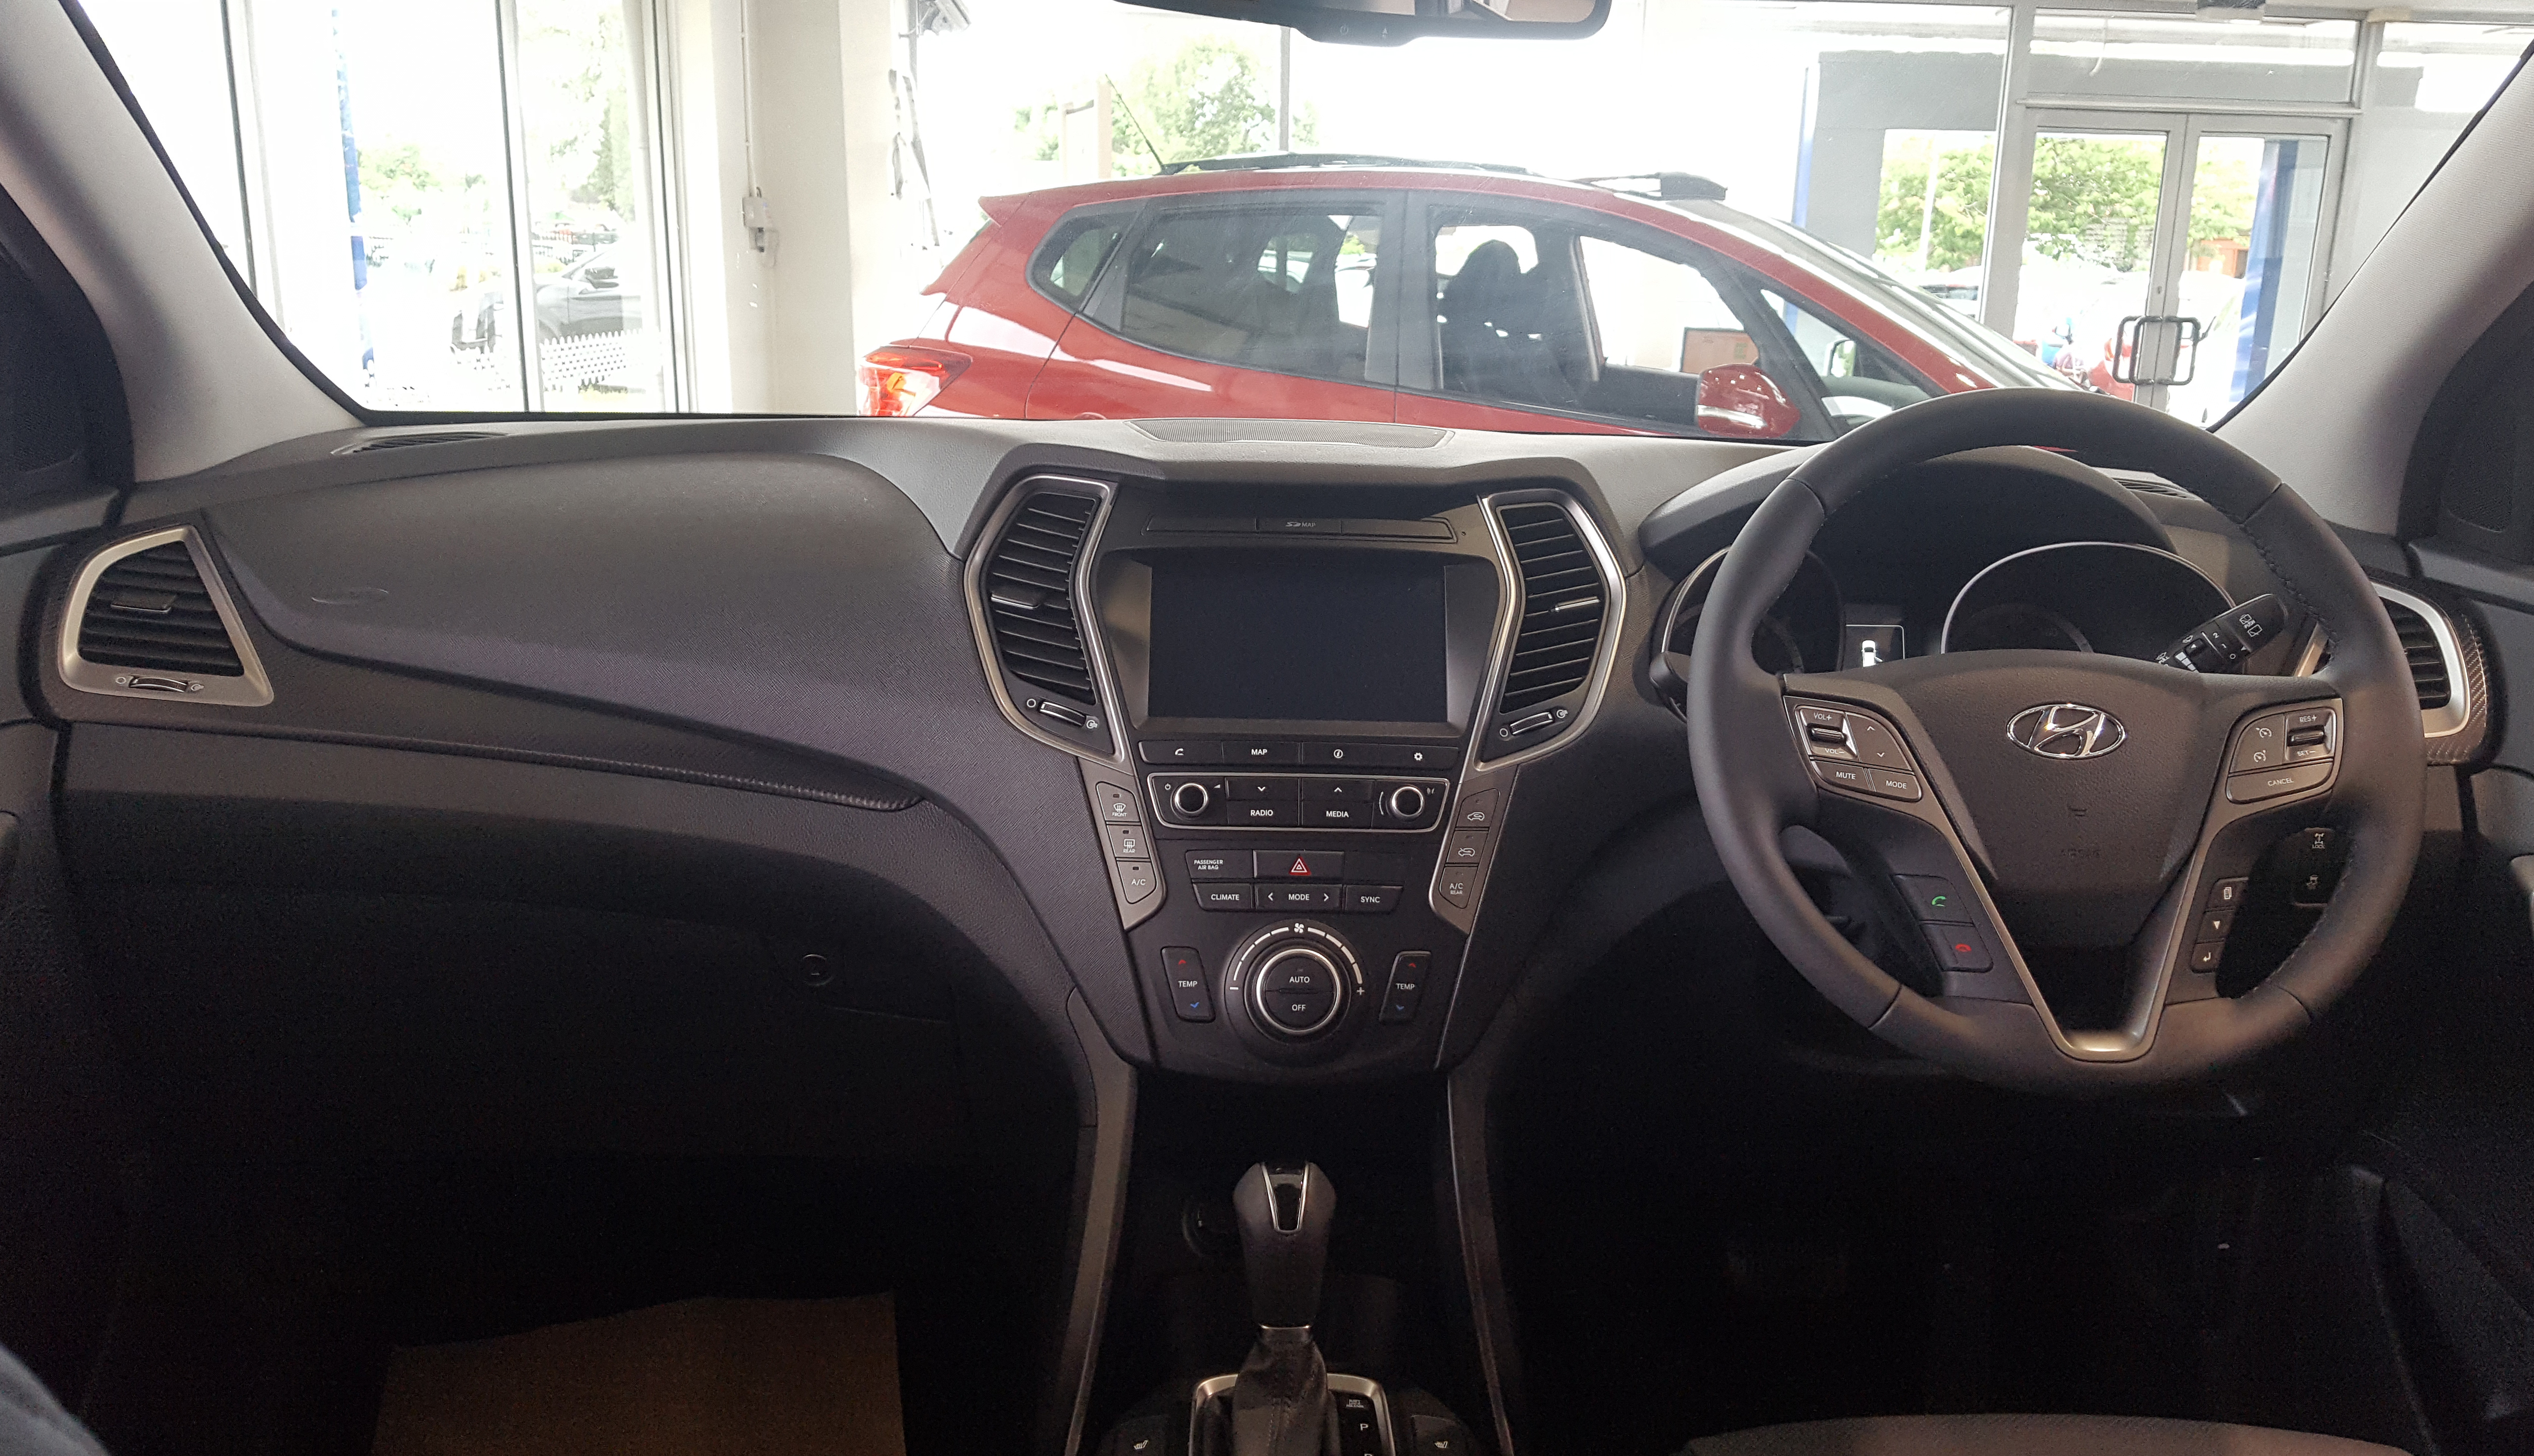 File:2018 Hyundai Santa Fe CRDi 4WD Interior.jpg - Wikimedia Commons